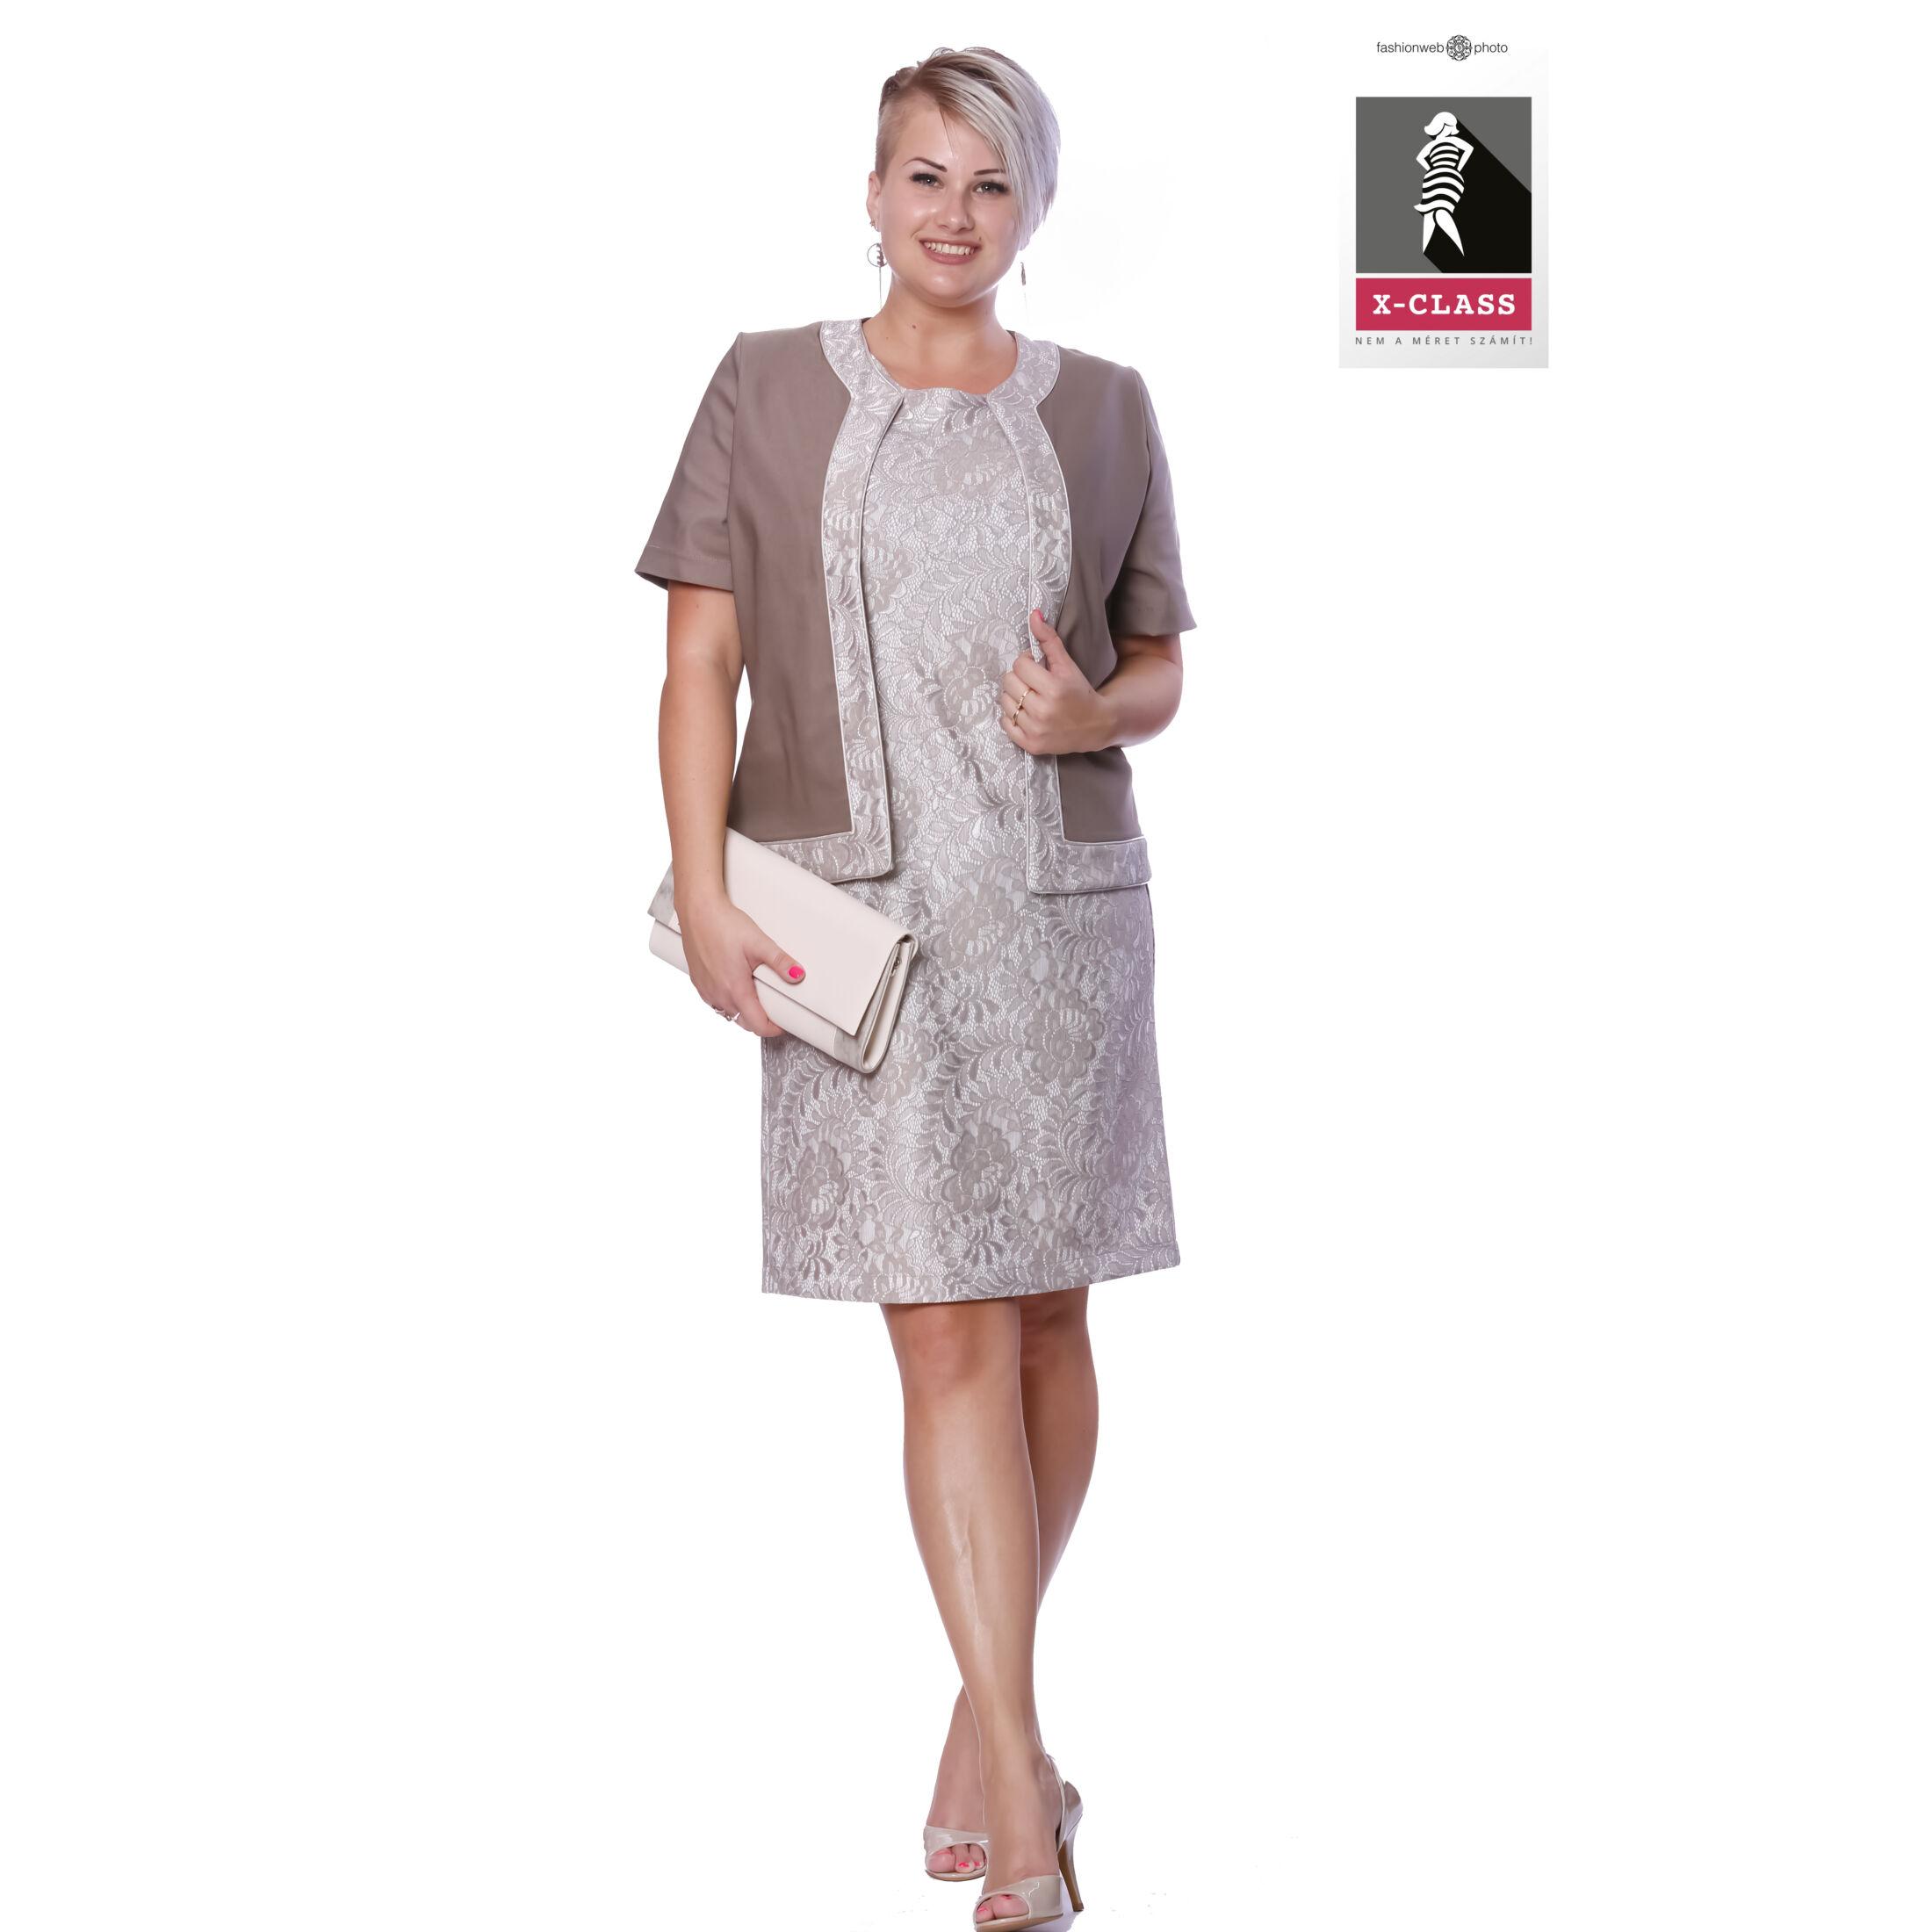 Alkalmi ruhák   Muriel kosztüm  44.990 Ft e8aa5a7161